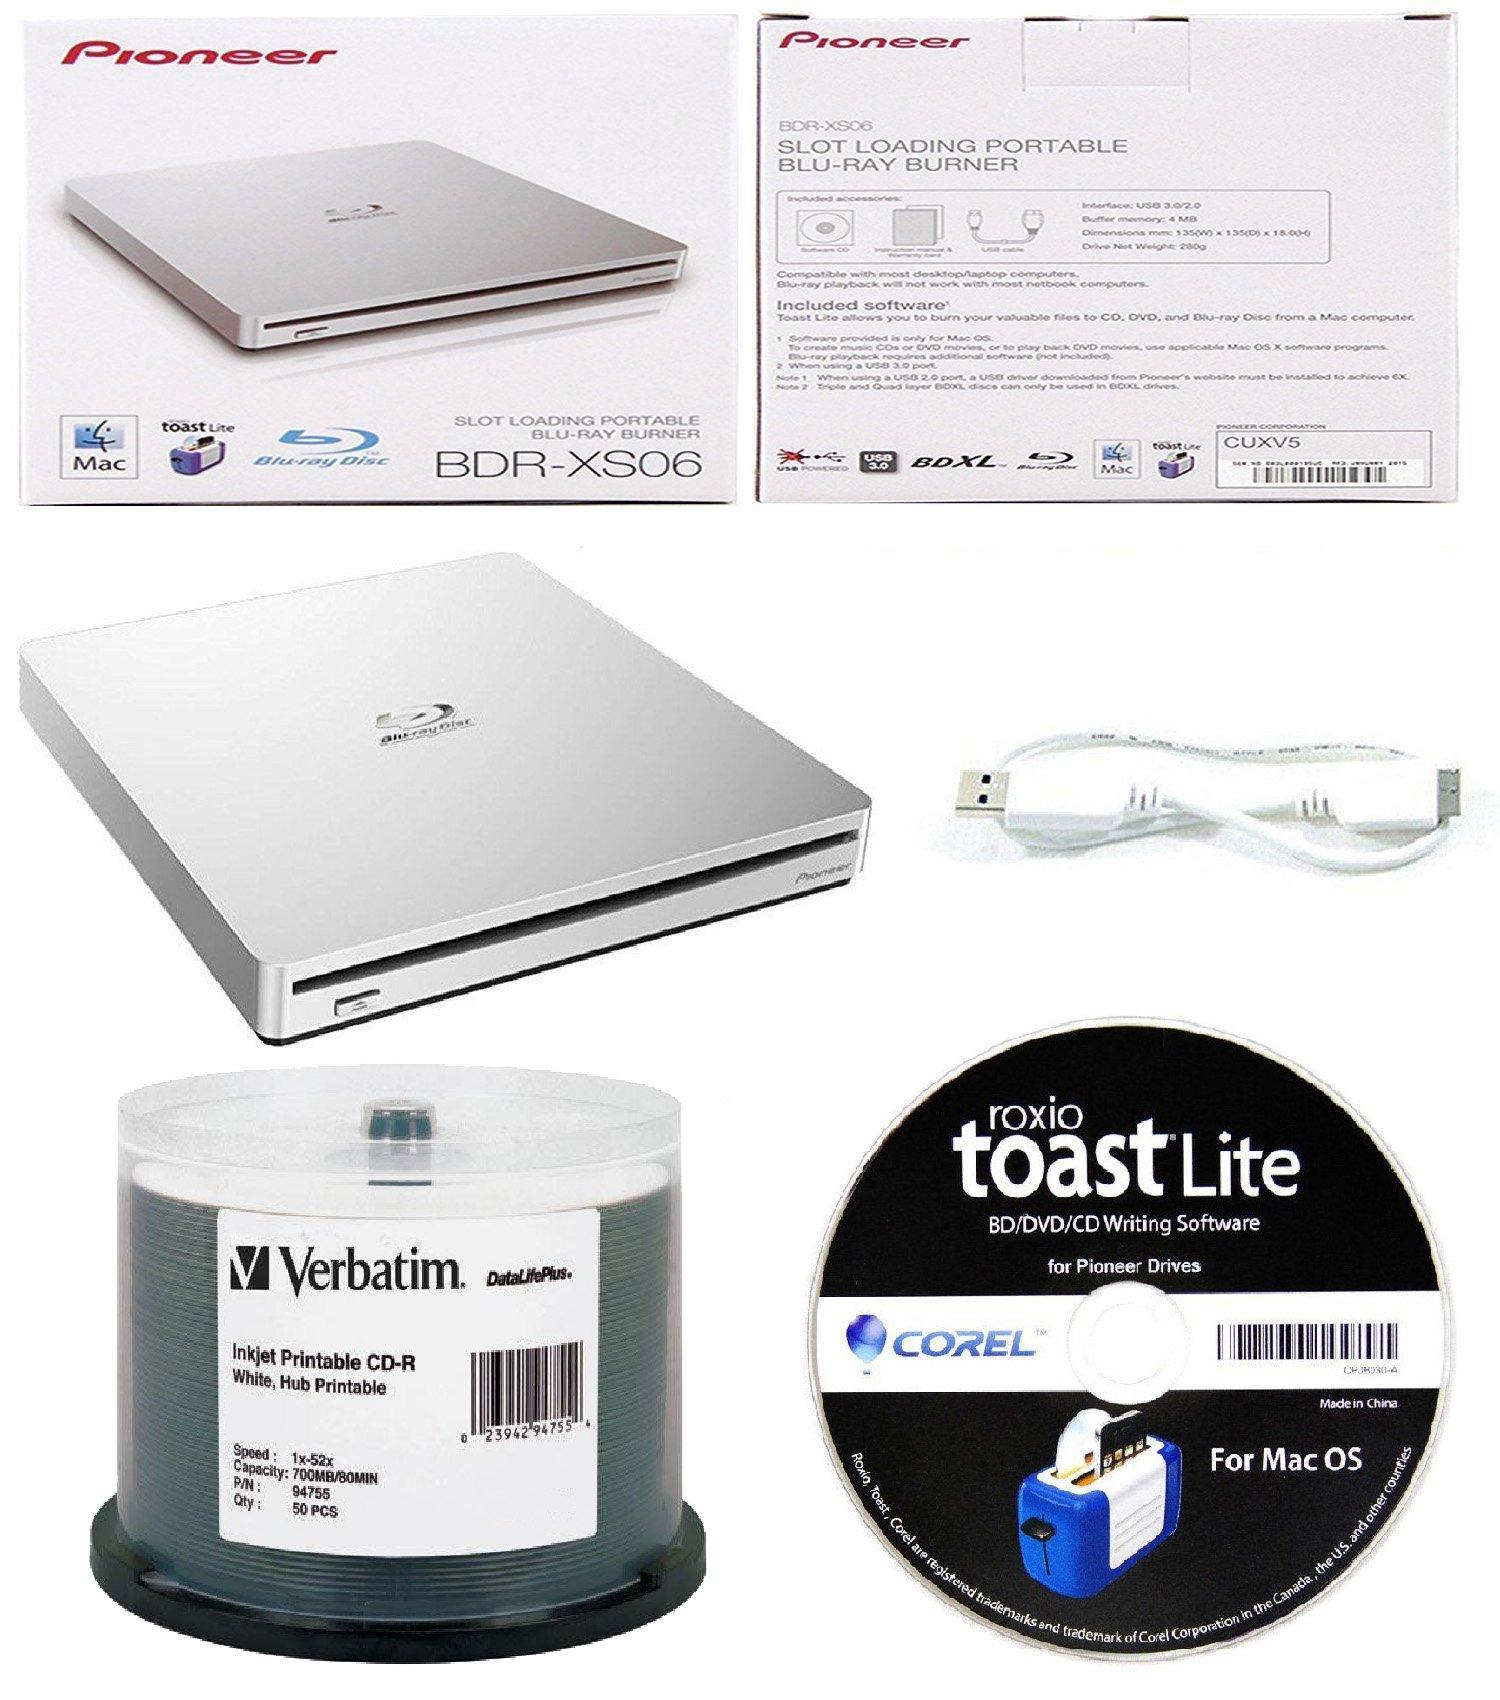 Pioneer 6x BDR-XS06 Slim Slot Portable External Blu-ray BDXL Burner, Roxio Toast Lite Software and USB Cable Bundle with 50pk CD-R Verbatim 700MB 52X DataLifePlus White Inkjet, Hub Printable